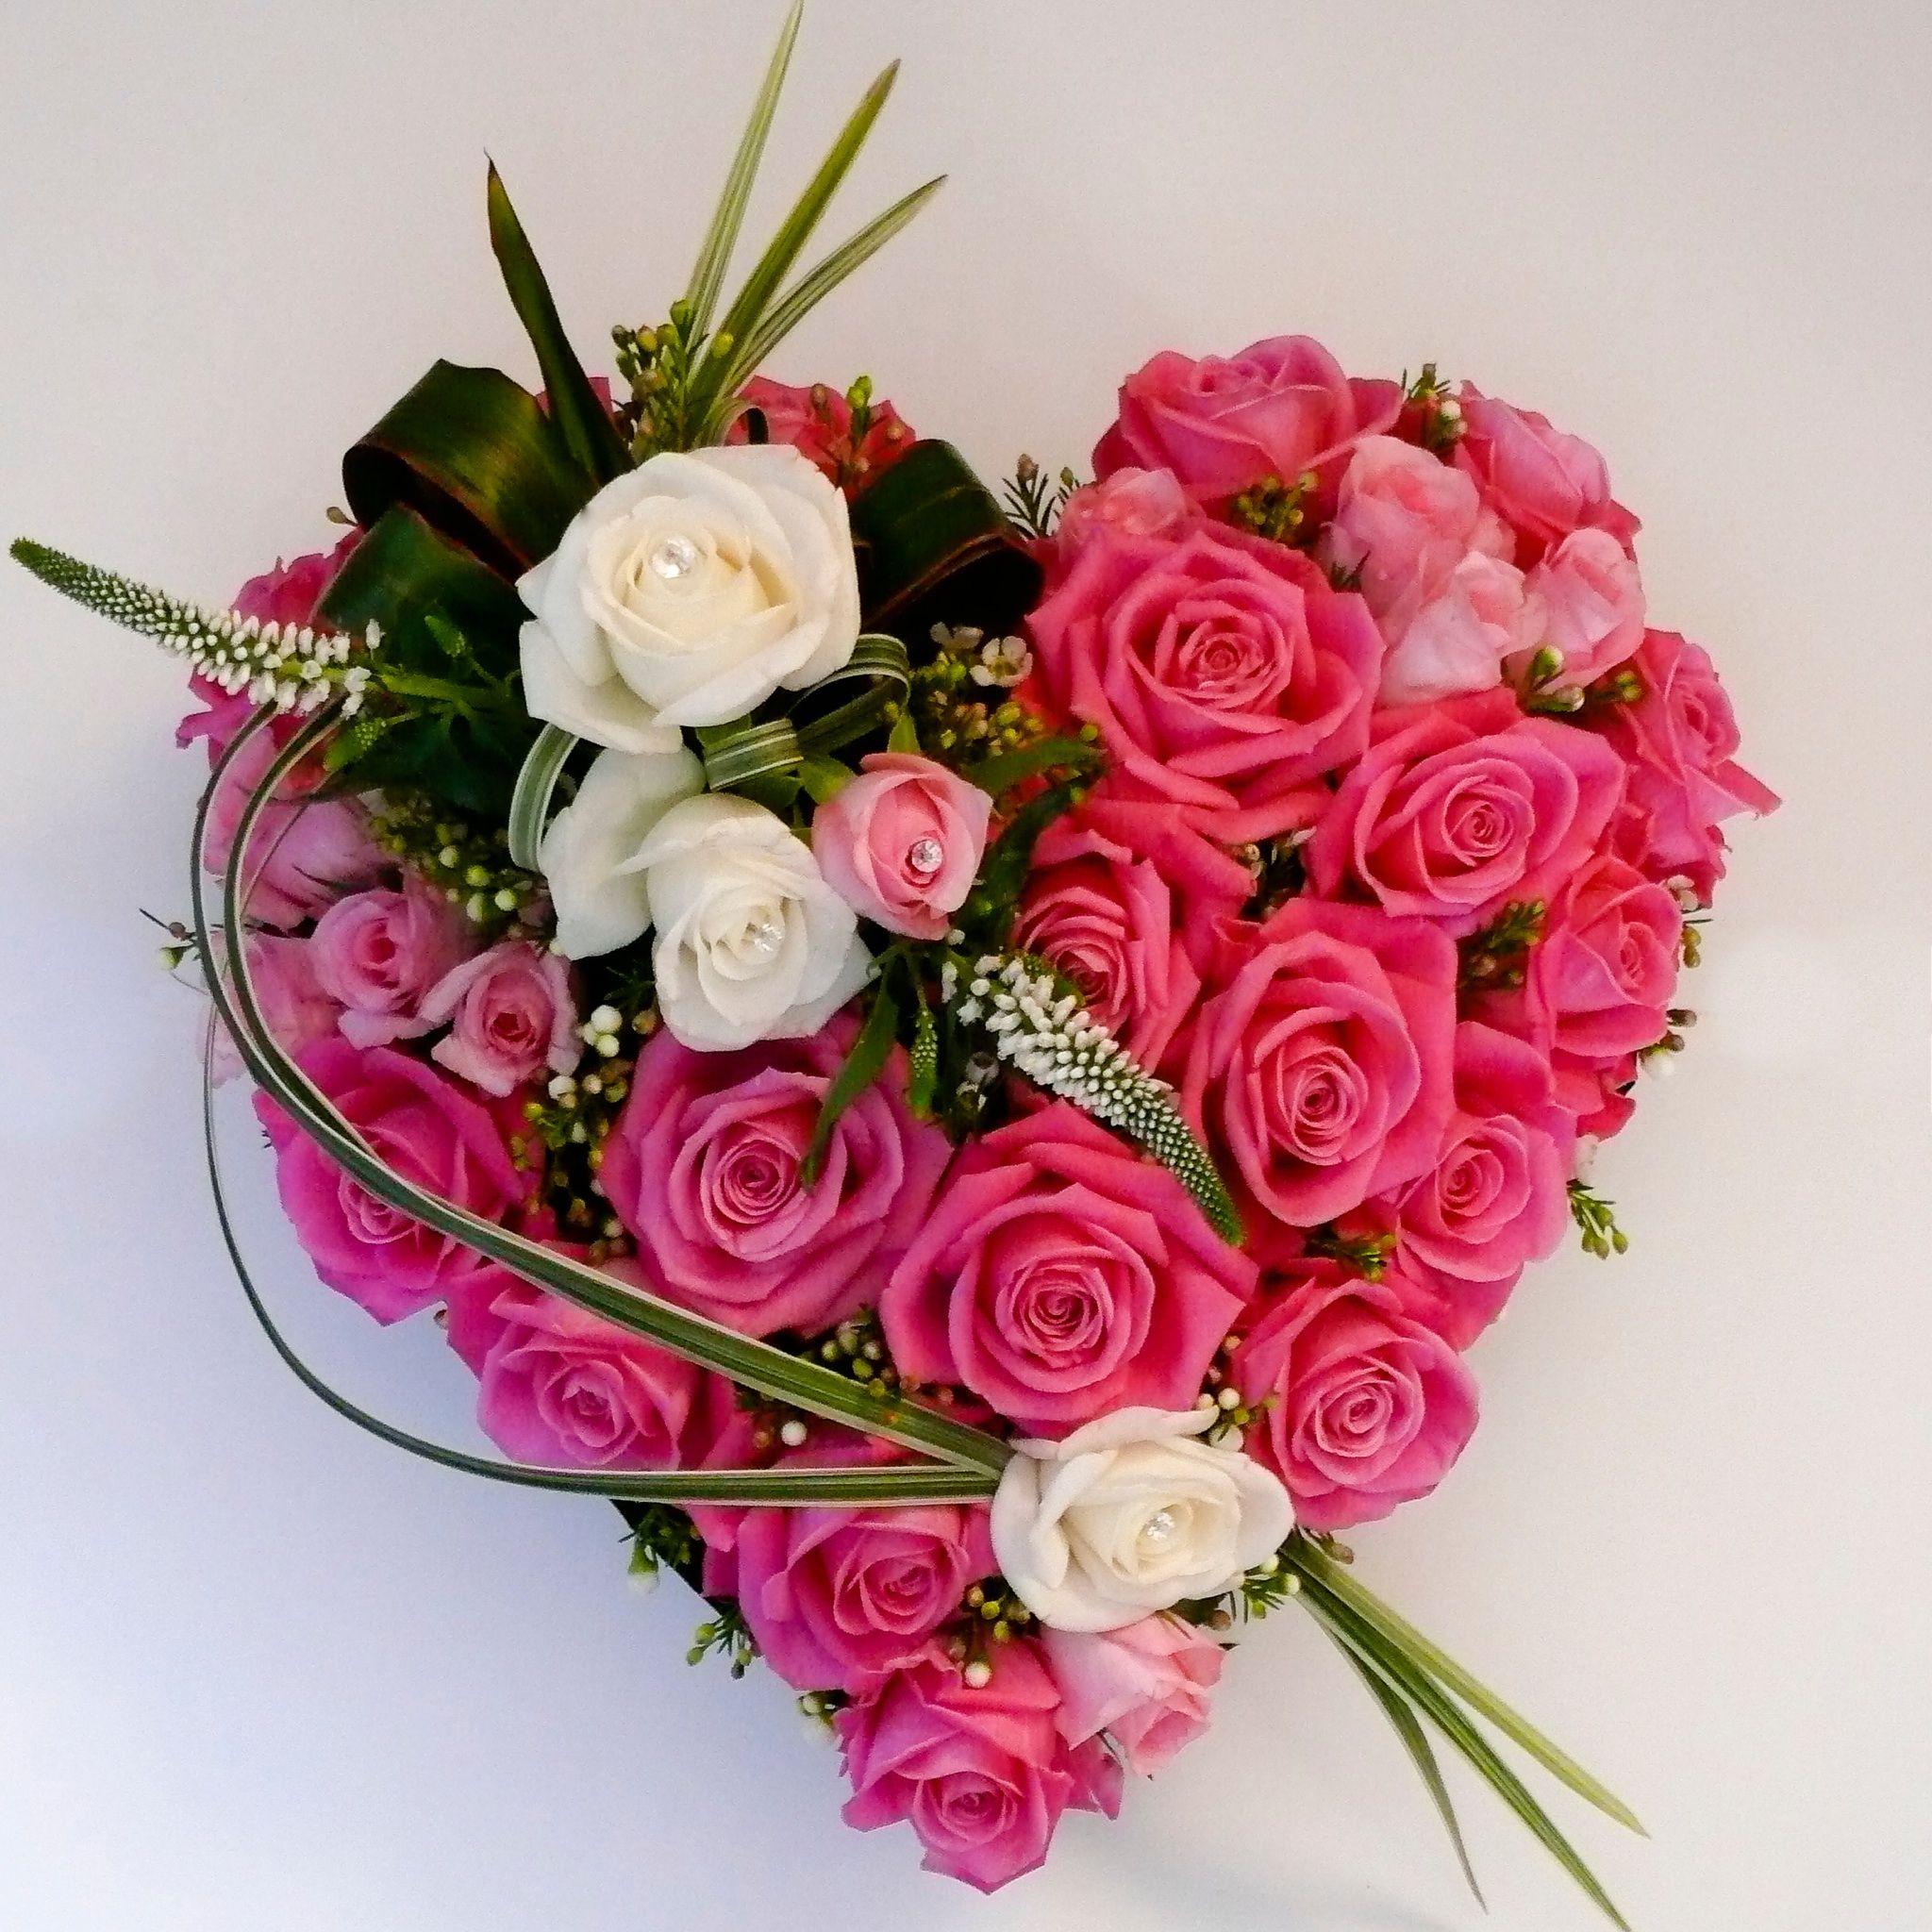 Tribute with love bu Jacqui O fairytale flowers